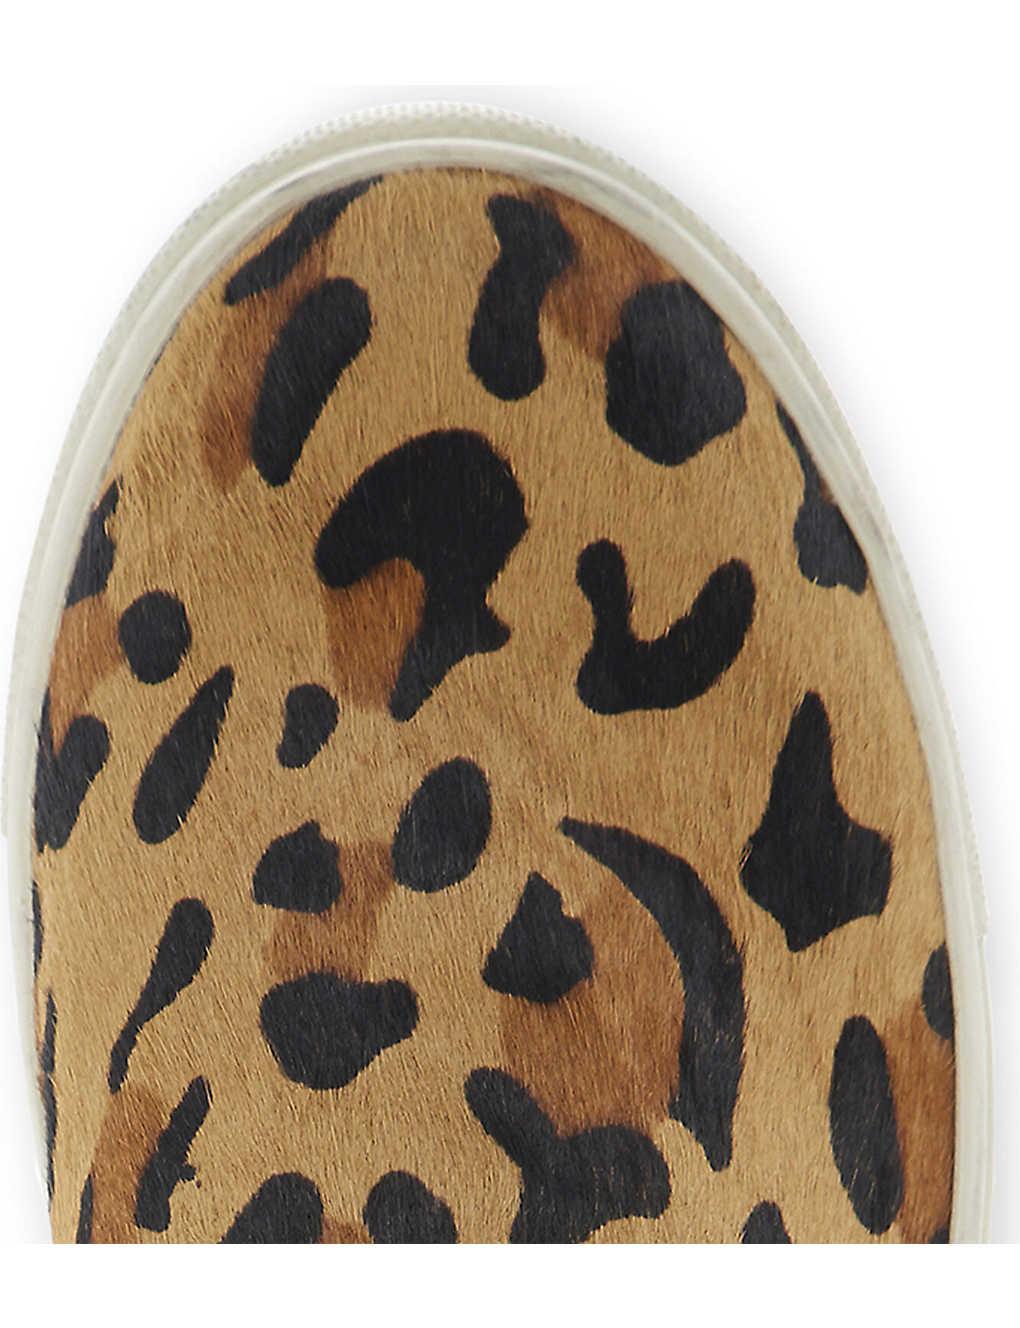 41741d48d56 STEVE MADDEN - Eccentric leopard print pony hair slip-on trainers ...